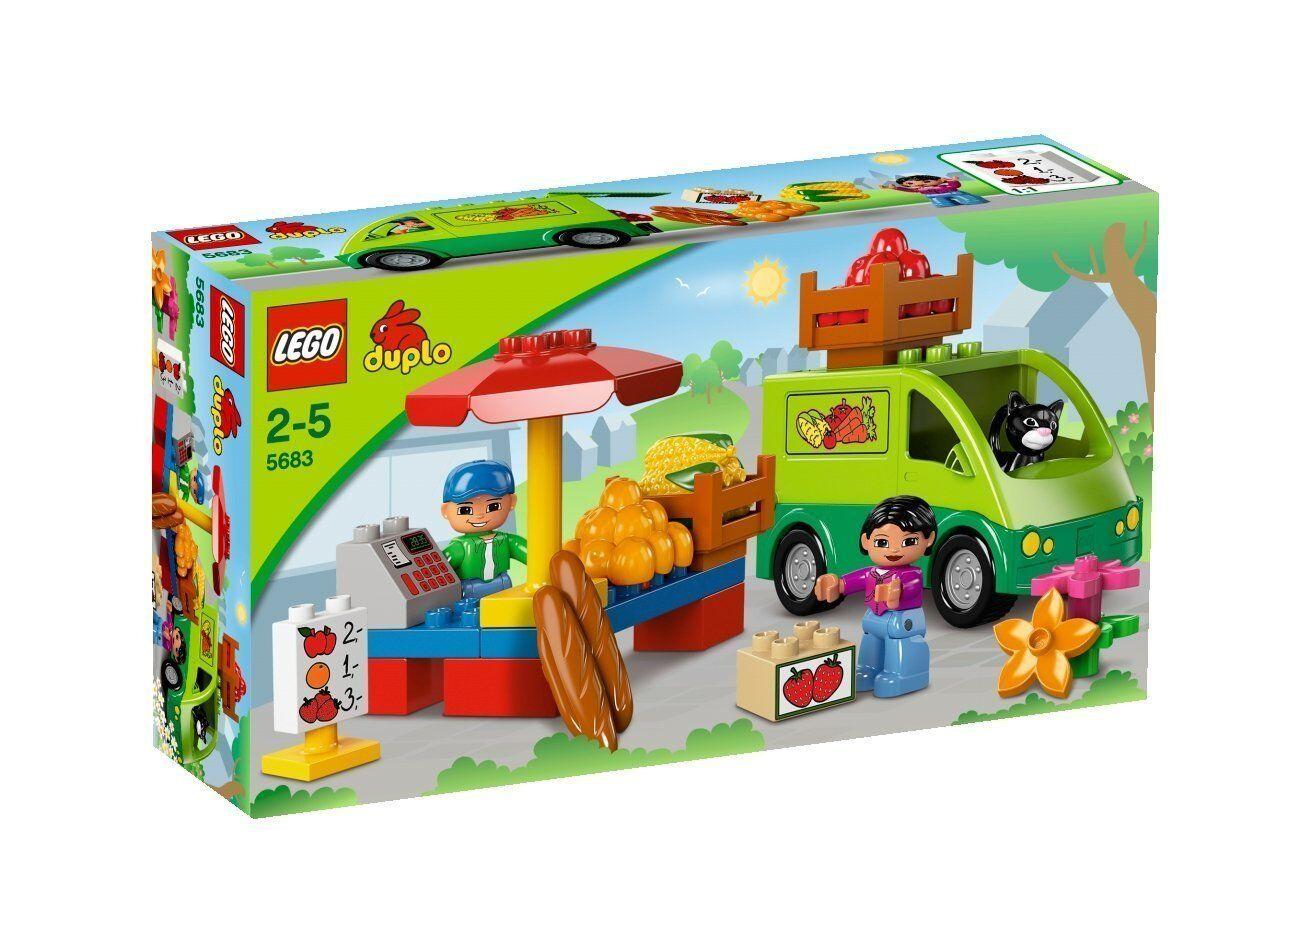 Lego Duplo 5683 Market Stand New Ovp Misb